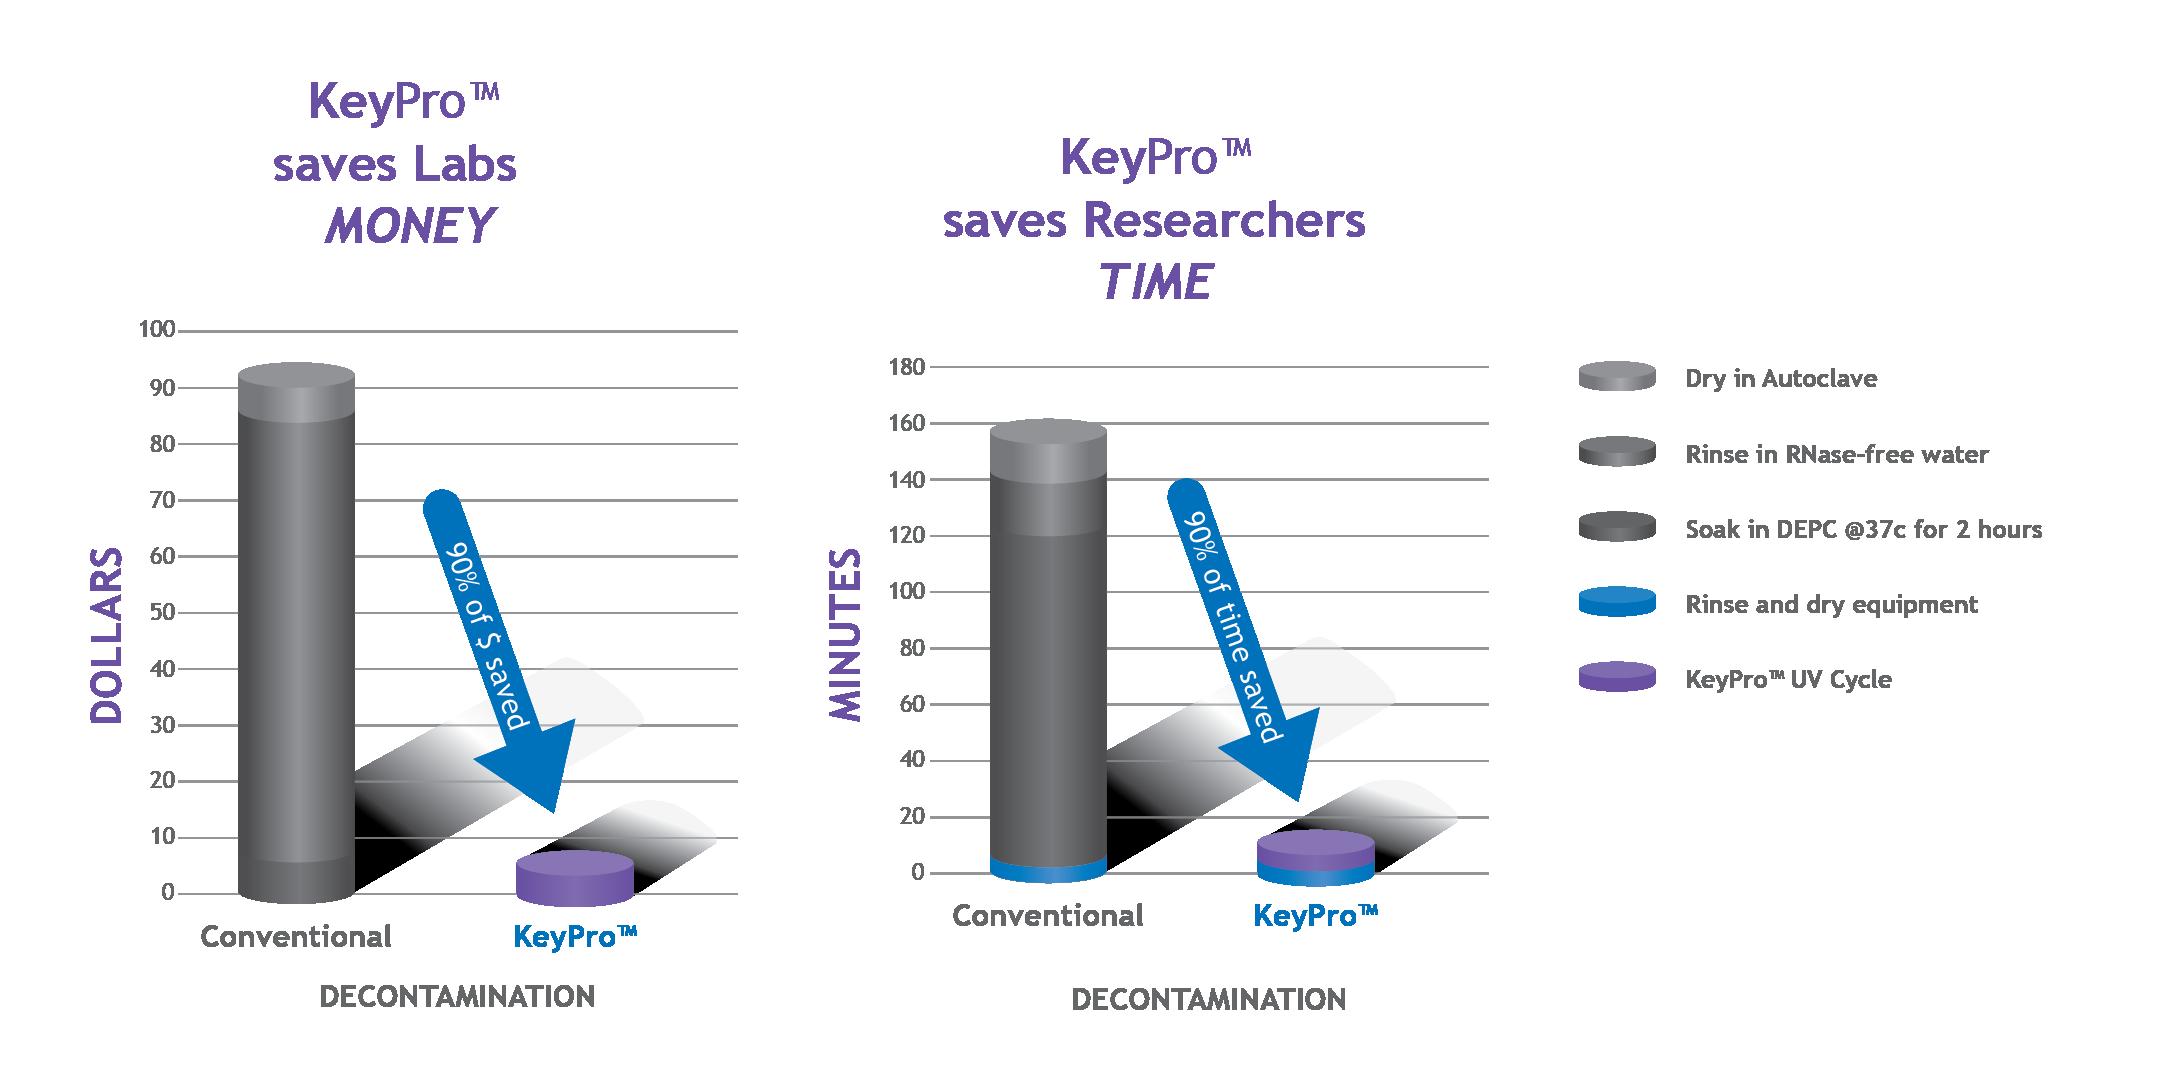 KeyPro-Decontamination-Graphs-01